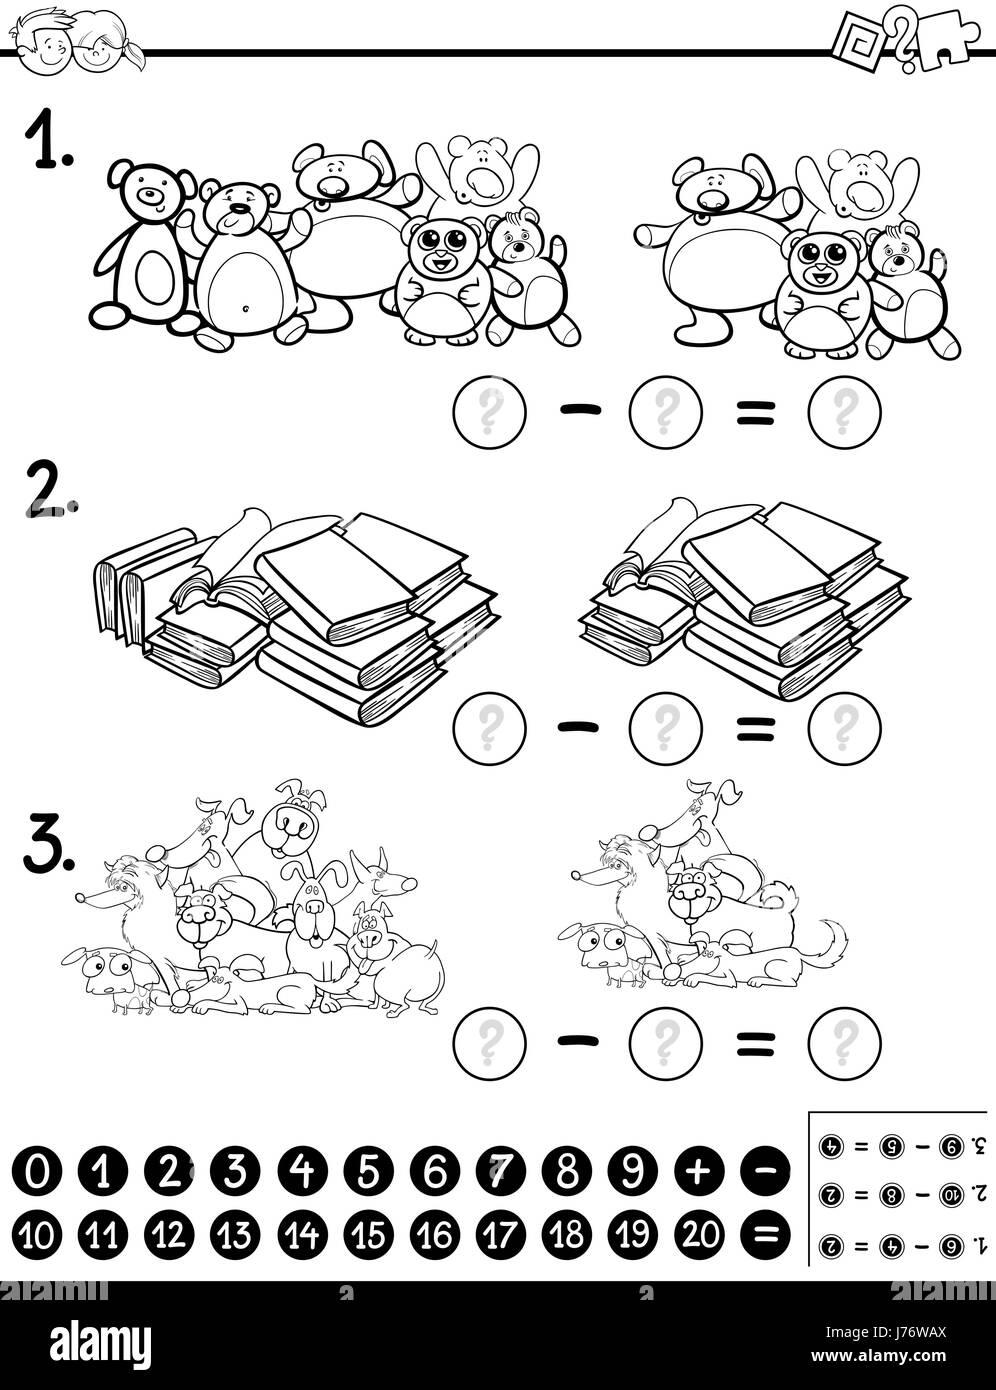 Subtraction Cartoon Stockfotos & Subtraction Cartoon Bilder - Alamy